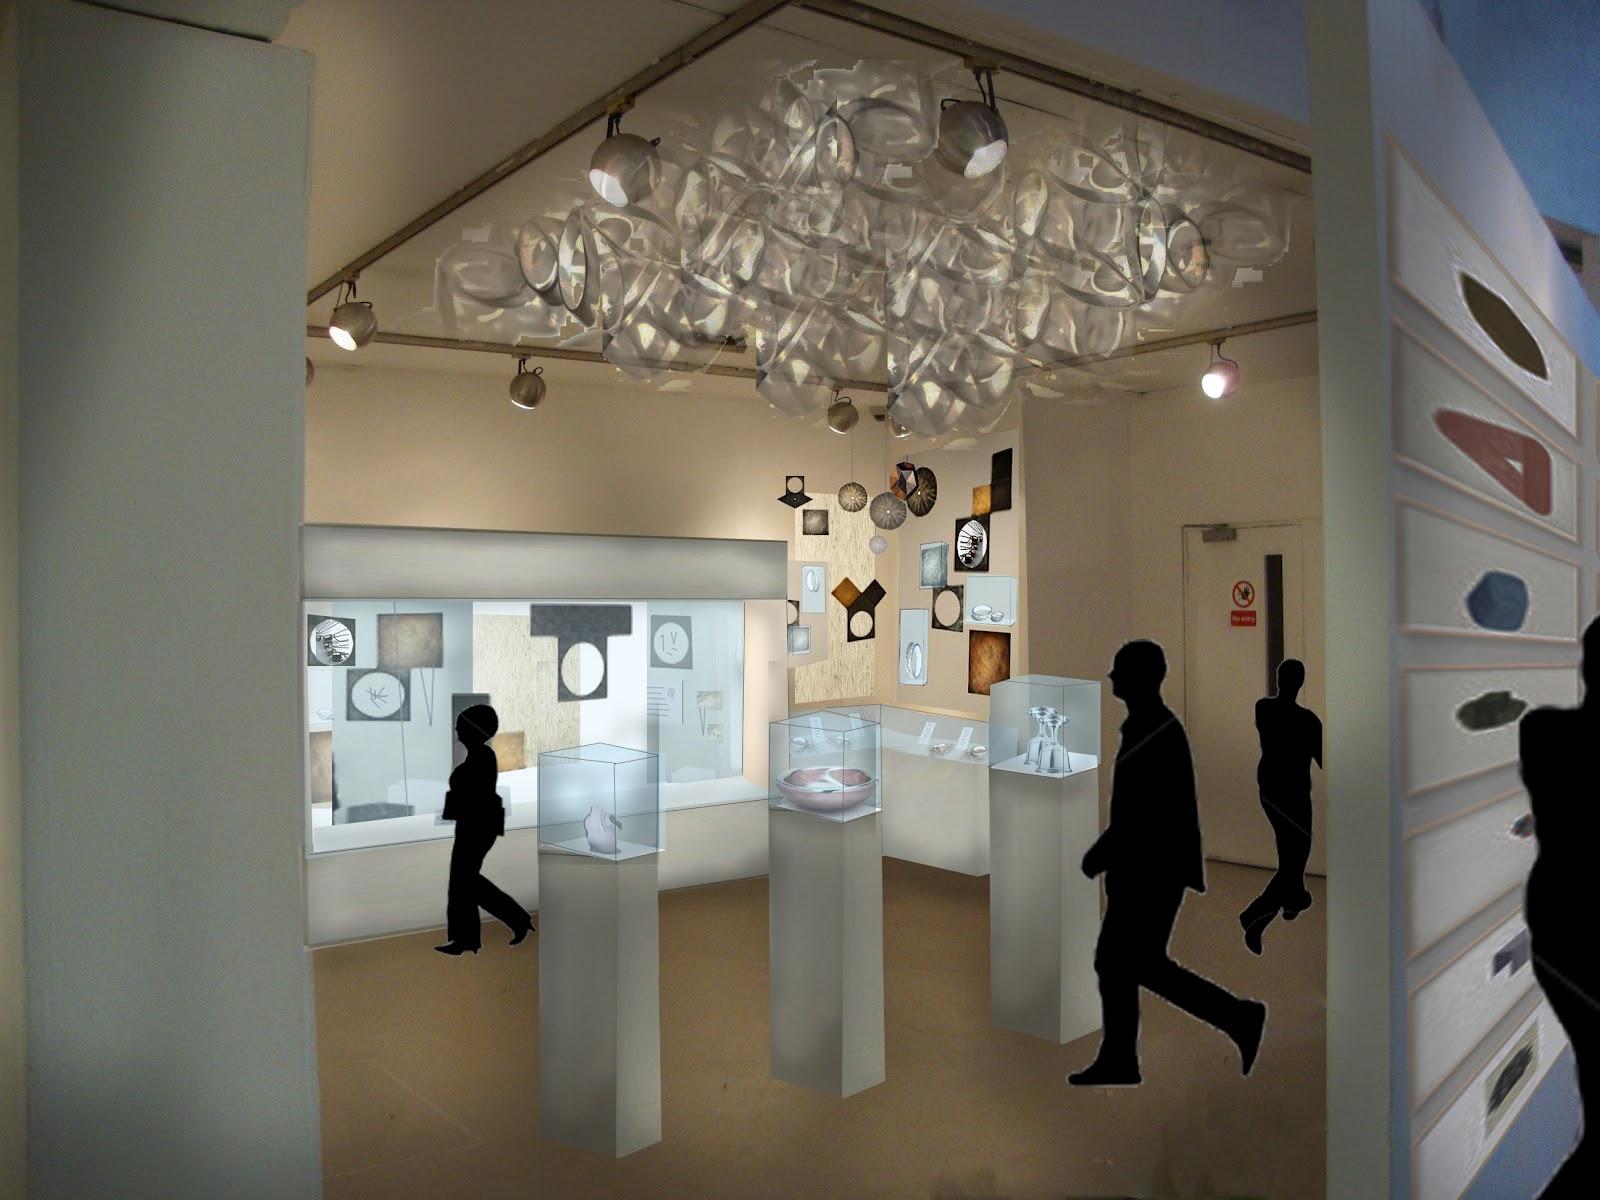 Interior Design: 2yr Newbury Tower, Jewellery Exhibition